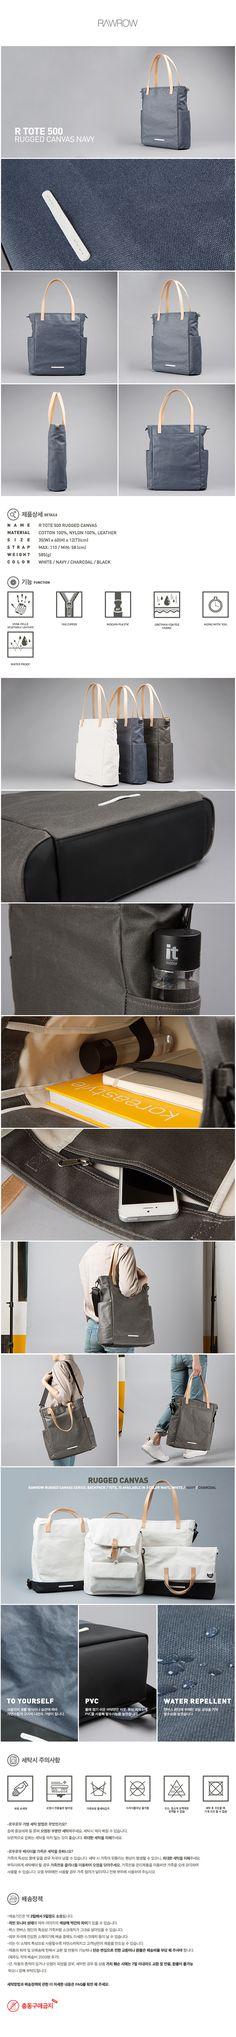 - [R TOTE 500 RUGGED帆布NAVY Ebags BackPack Tumblr | leather backpack tumblr | cute backpacks tumblr http://ebagsbackpack.tumblr.com/